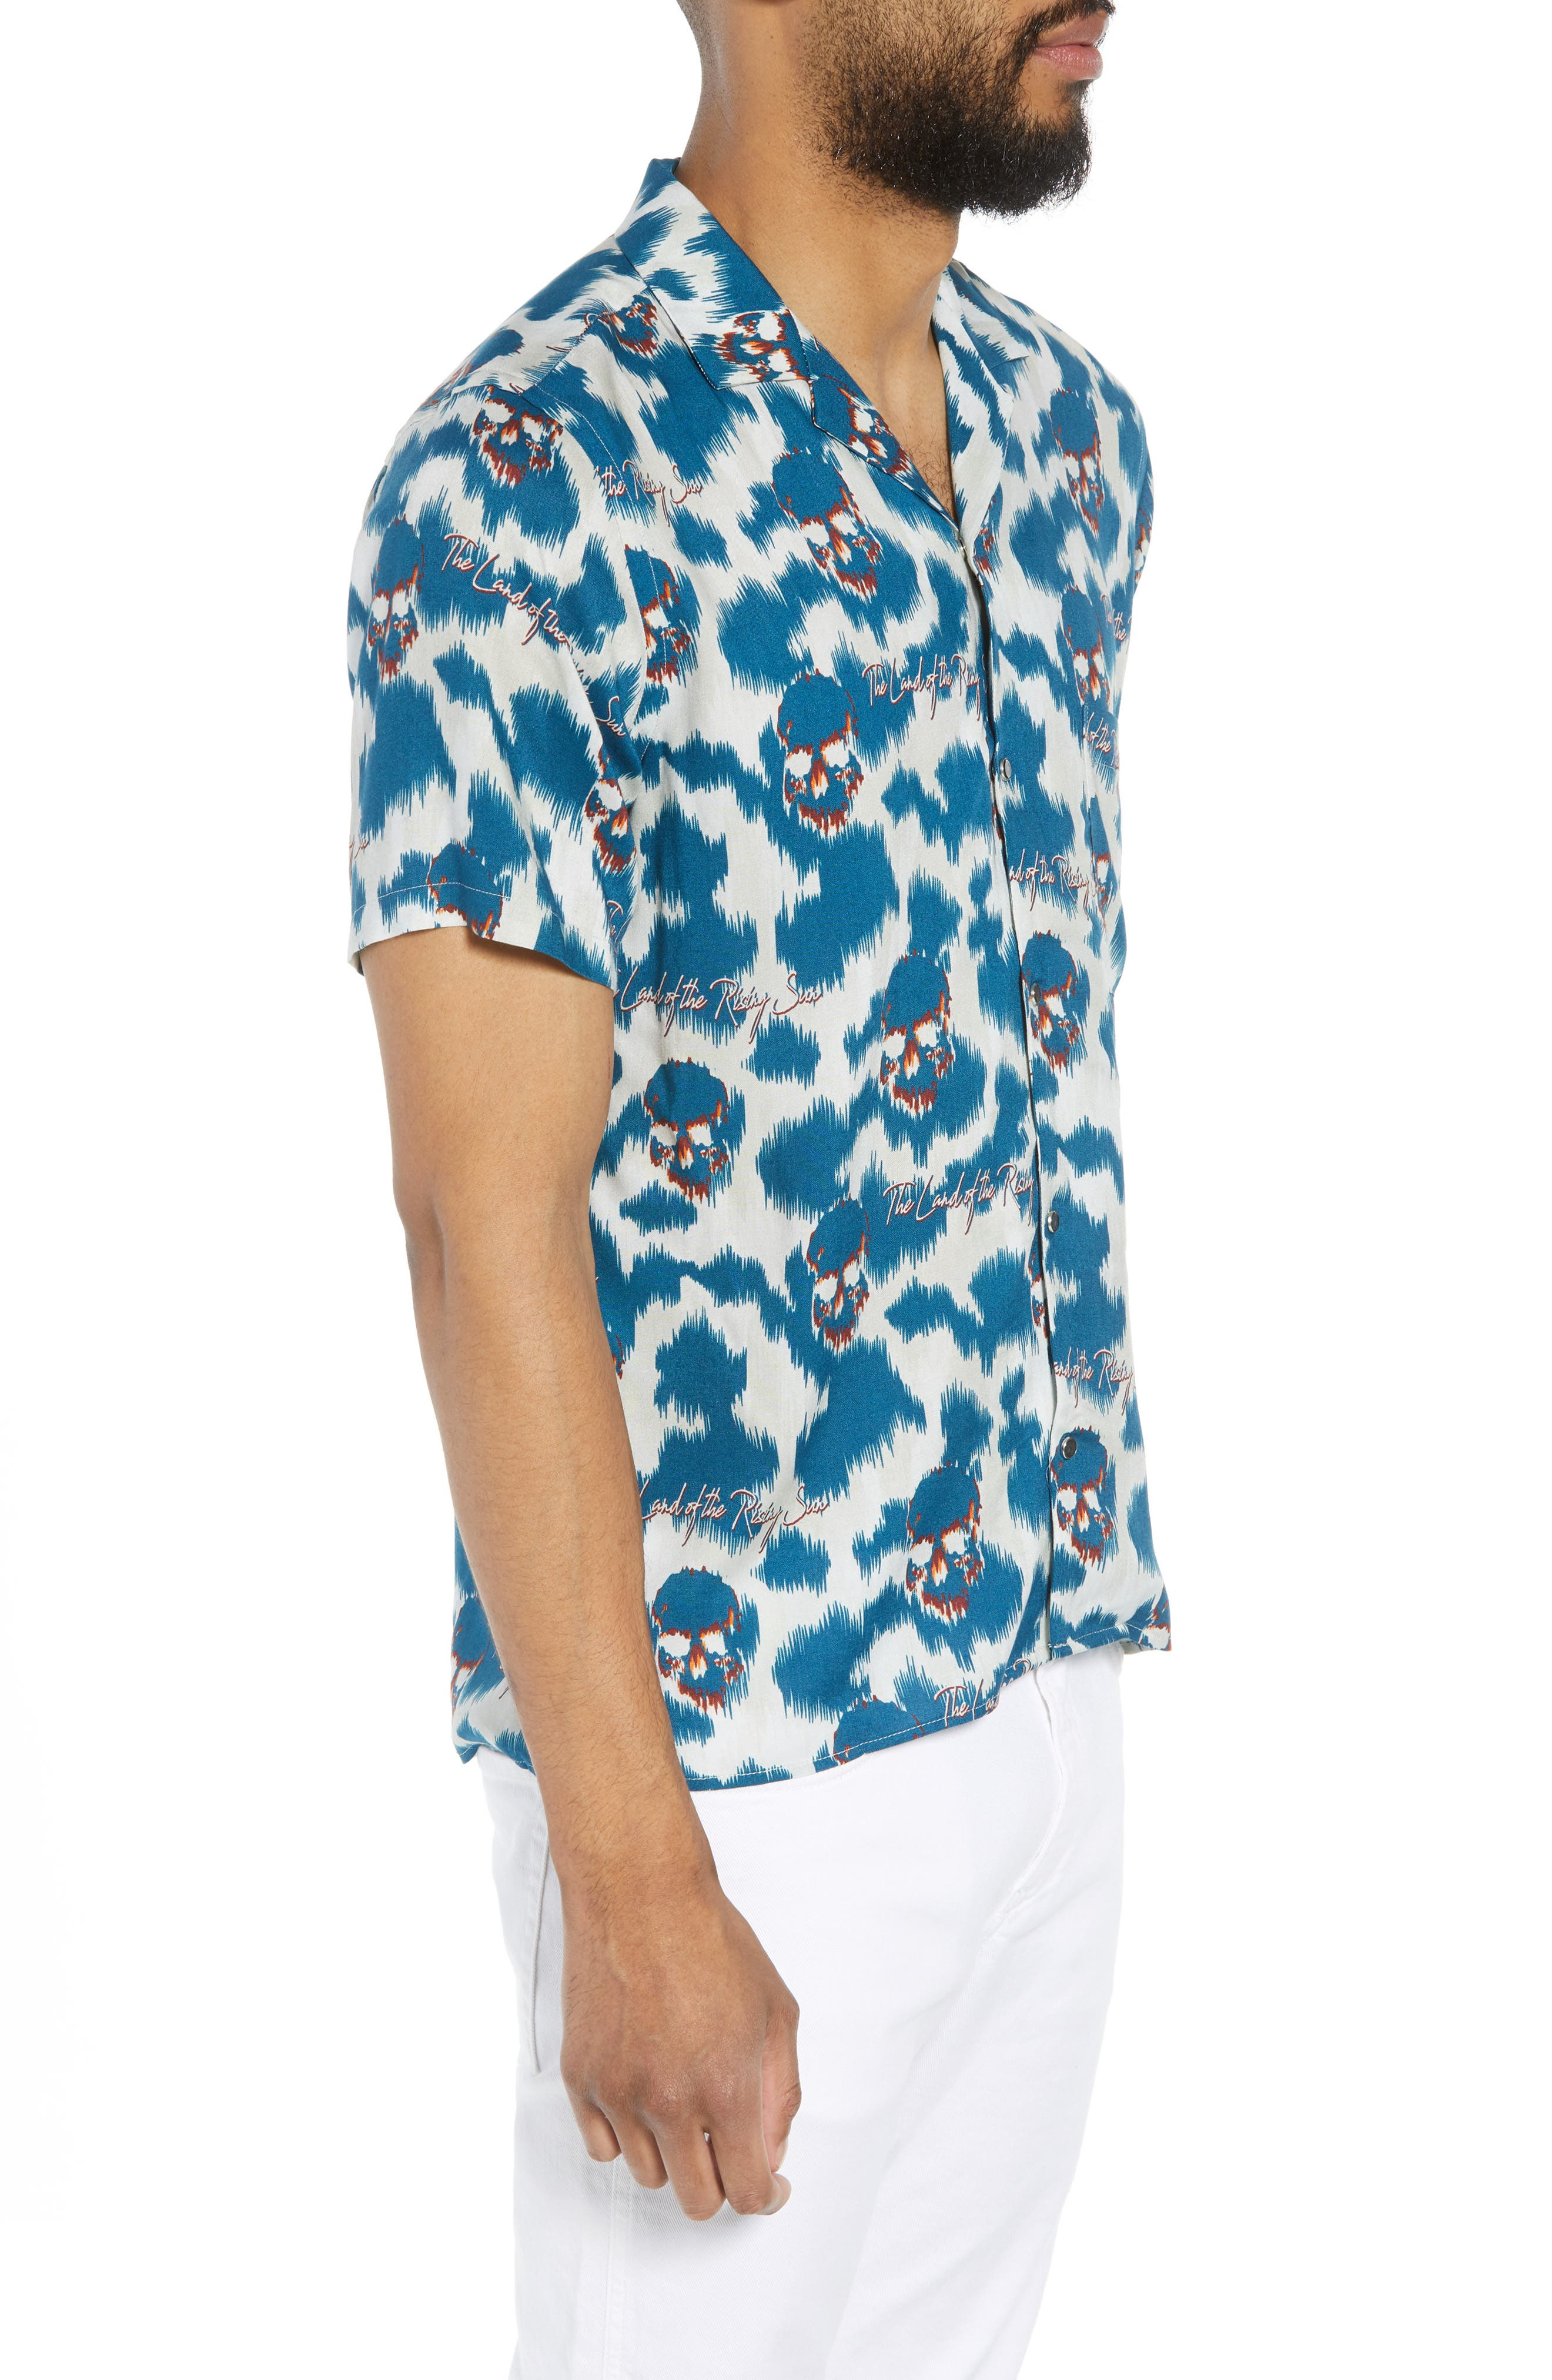 THE KOOPLES,                             Regular Fit Hawaiian Shirt,                             Alternate thumbnail 3, color,                             400